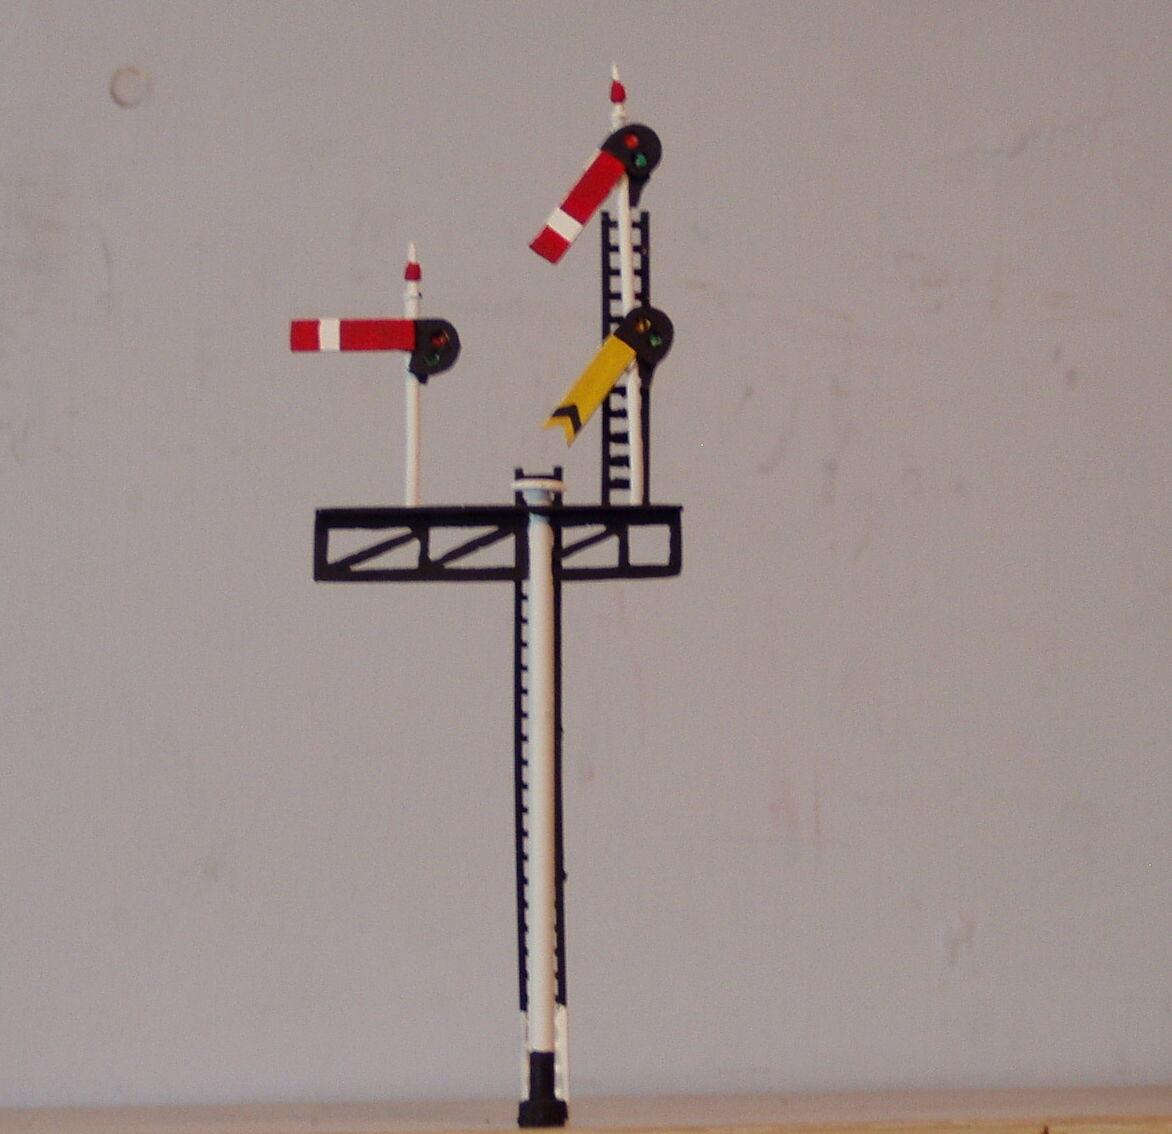 P&d Marsh Oo-Messgerät Z354l Gwr   Br Behig Junction Signal Bemalt & Gefertigt